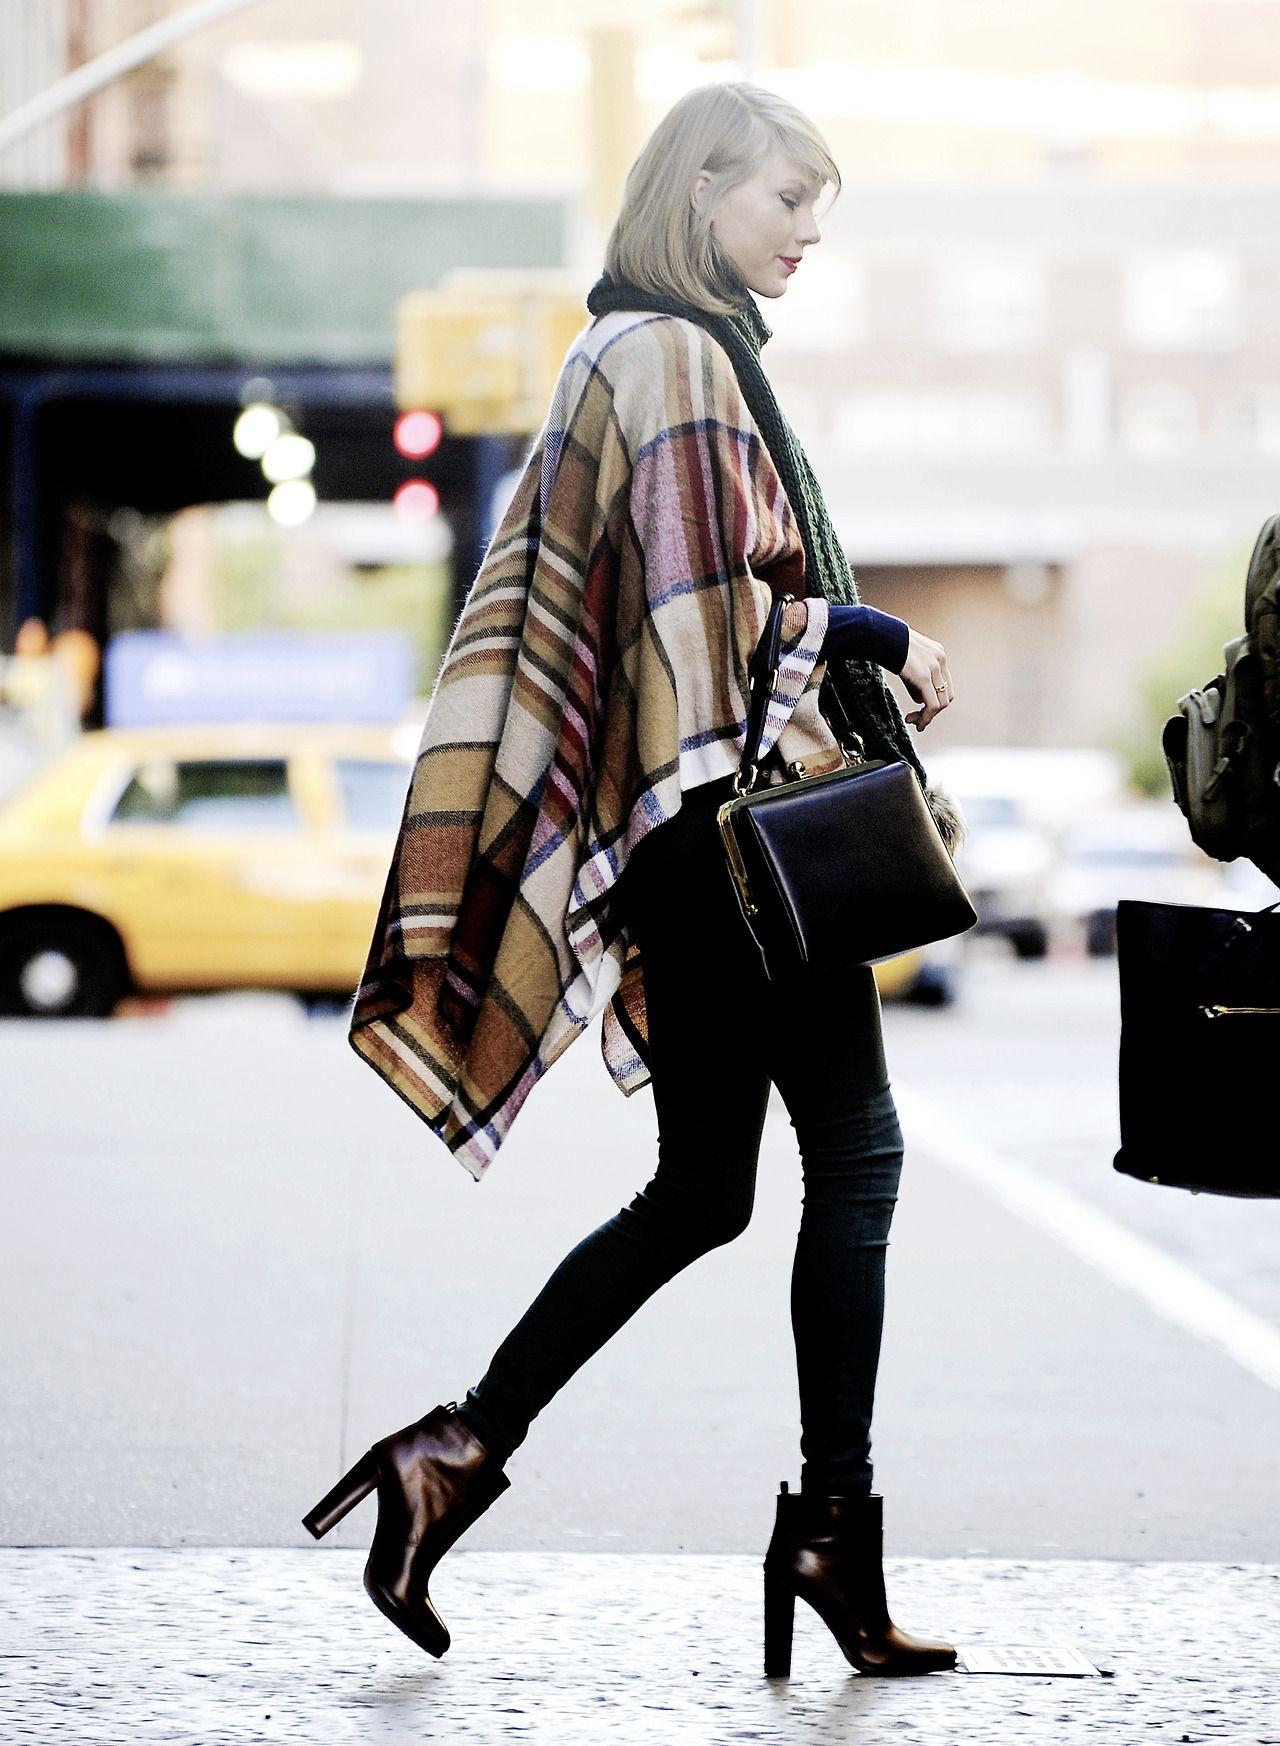 Taylor swift sexy fall /Winter style.